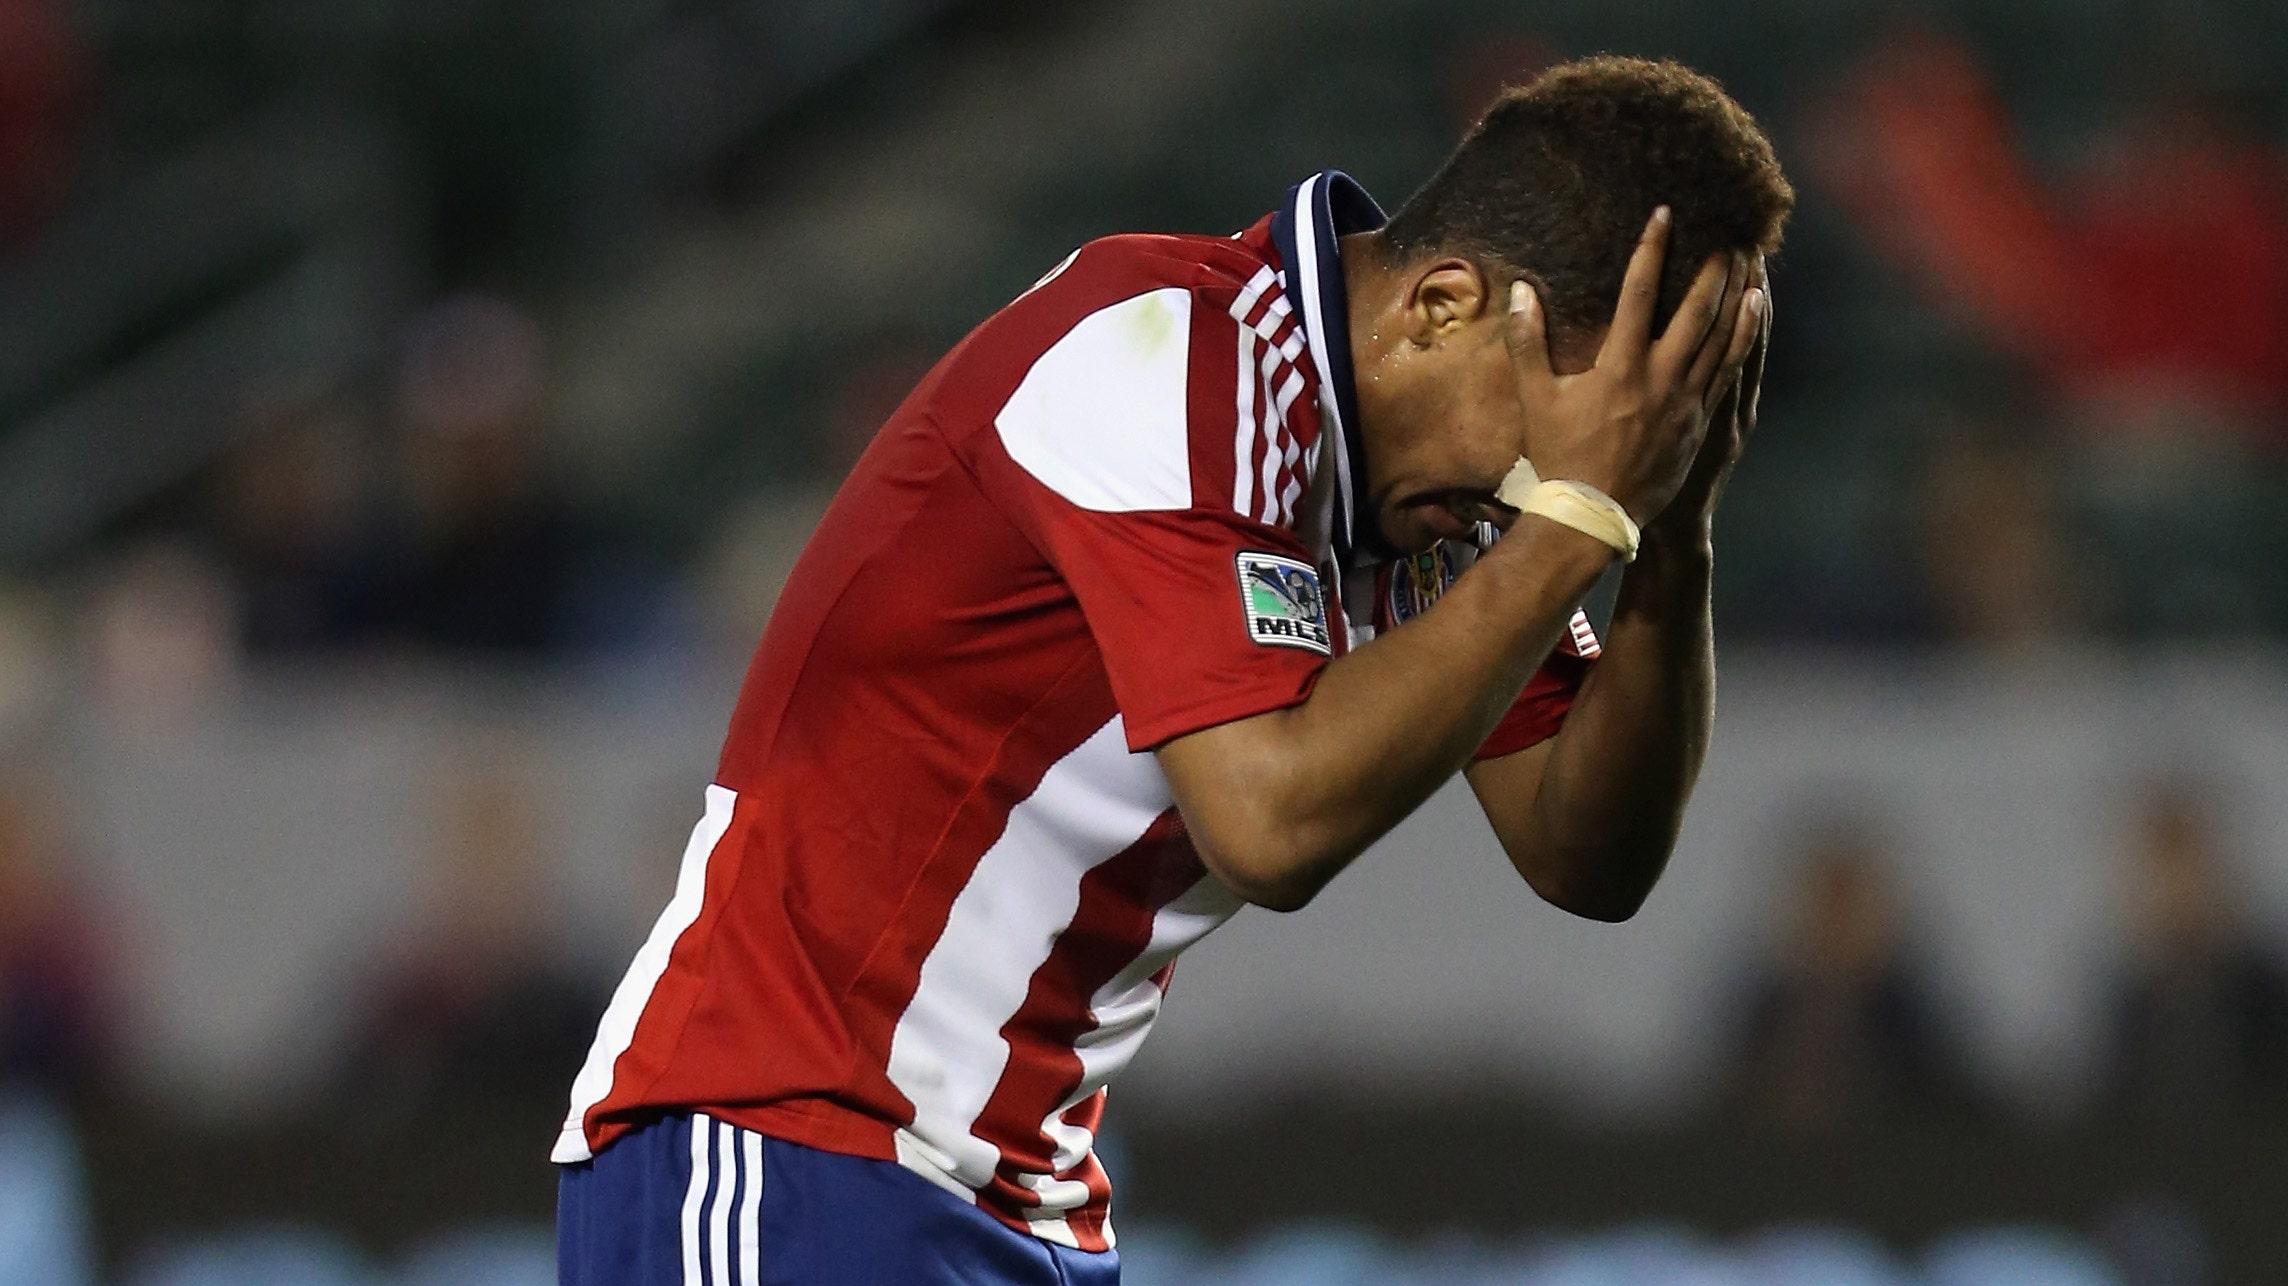 mls soccer team chivas usa hit with third discrimination